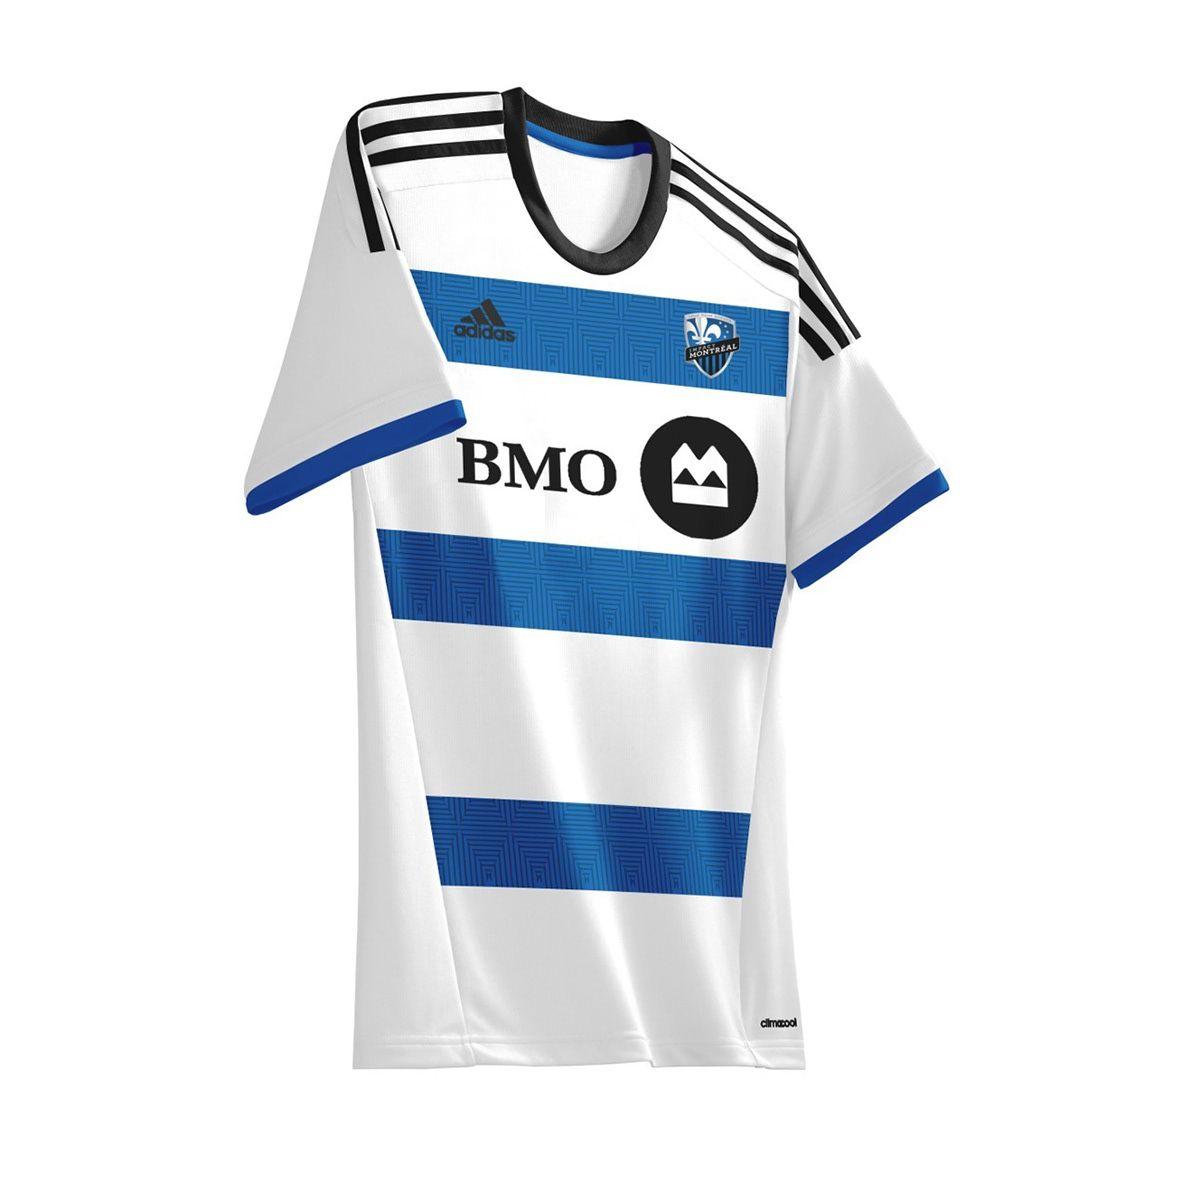 d5a54e431 Adidas MLS Concept Kits 2018 19 on Behance